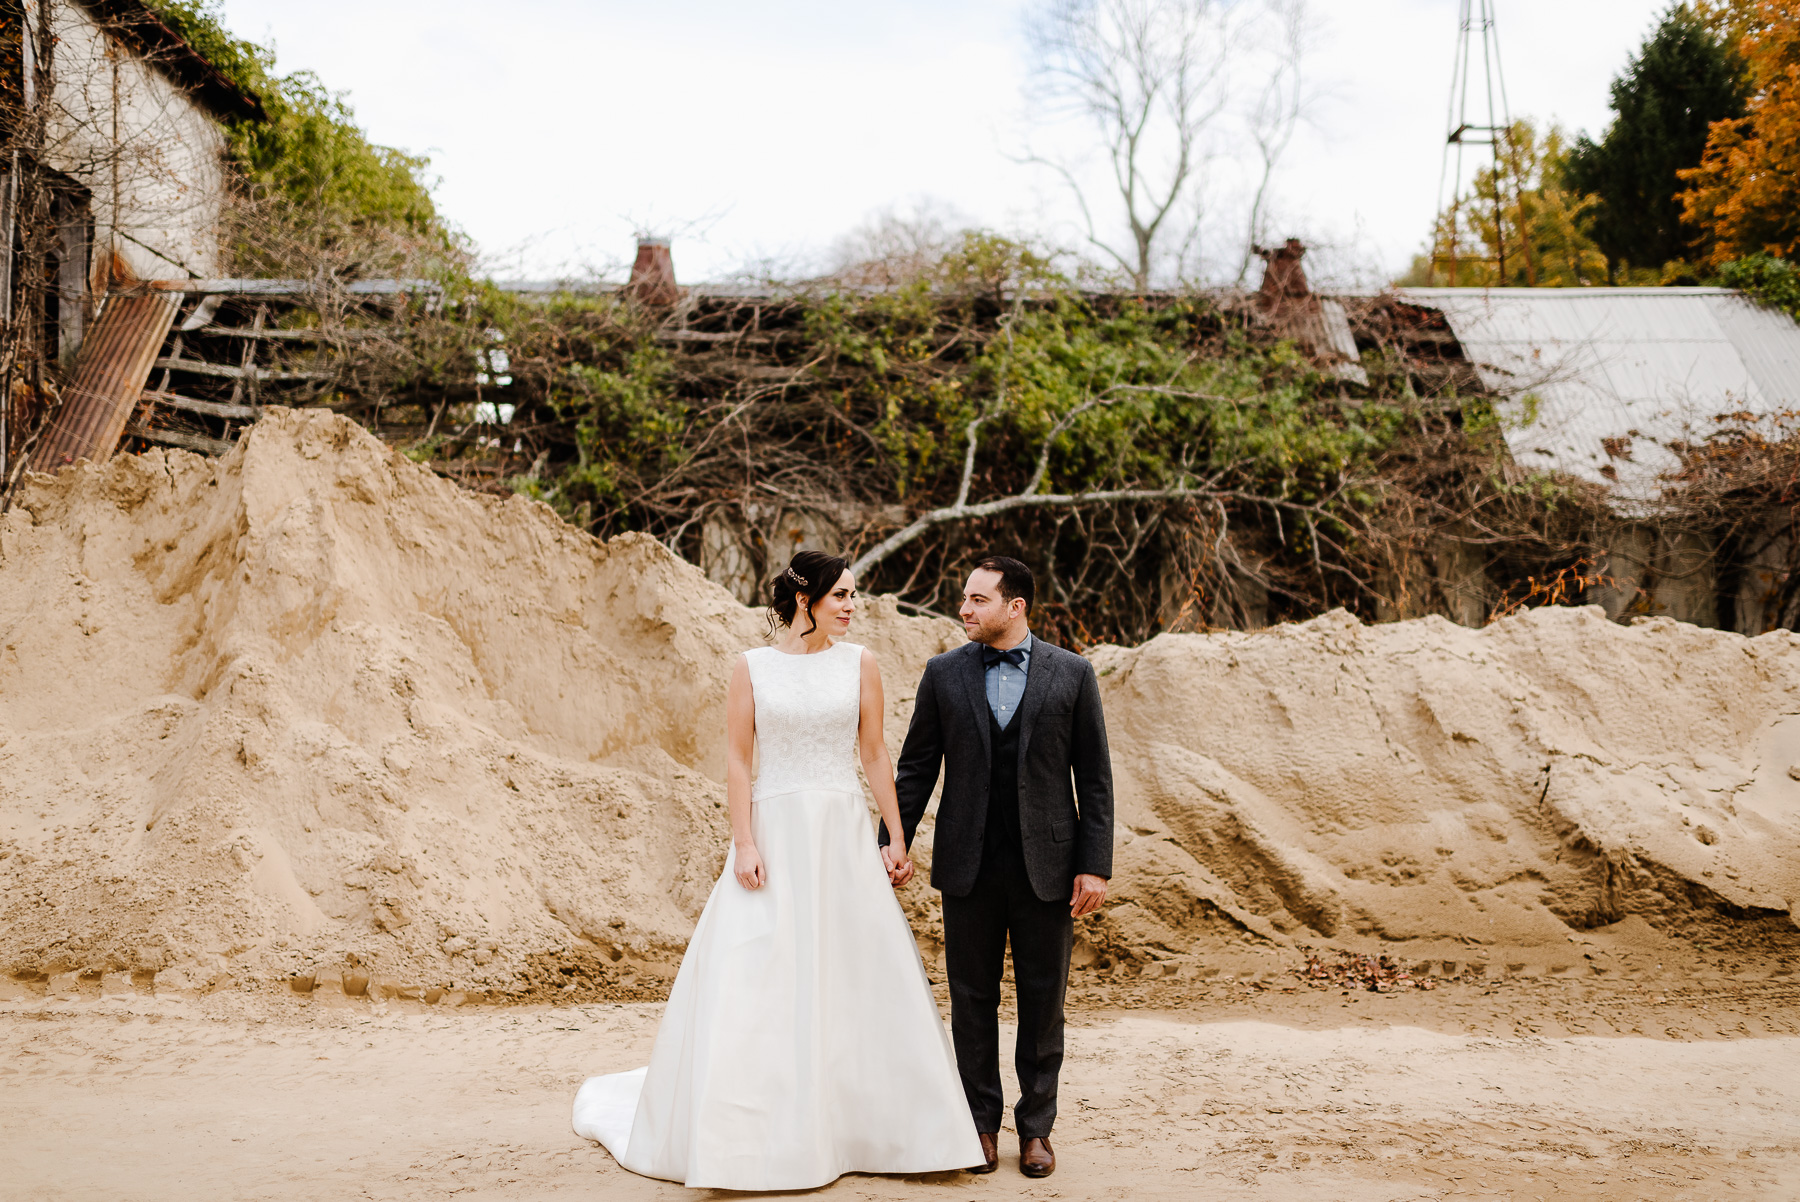 36-Laurita Winery Wedding New Jersey Wedding Photographer Laurita Winery Weddings Longbrook Photography.jpg